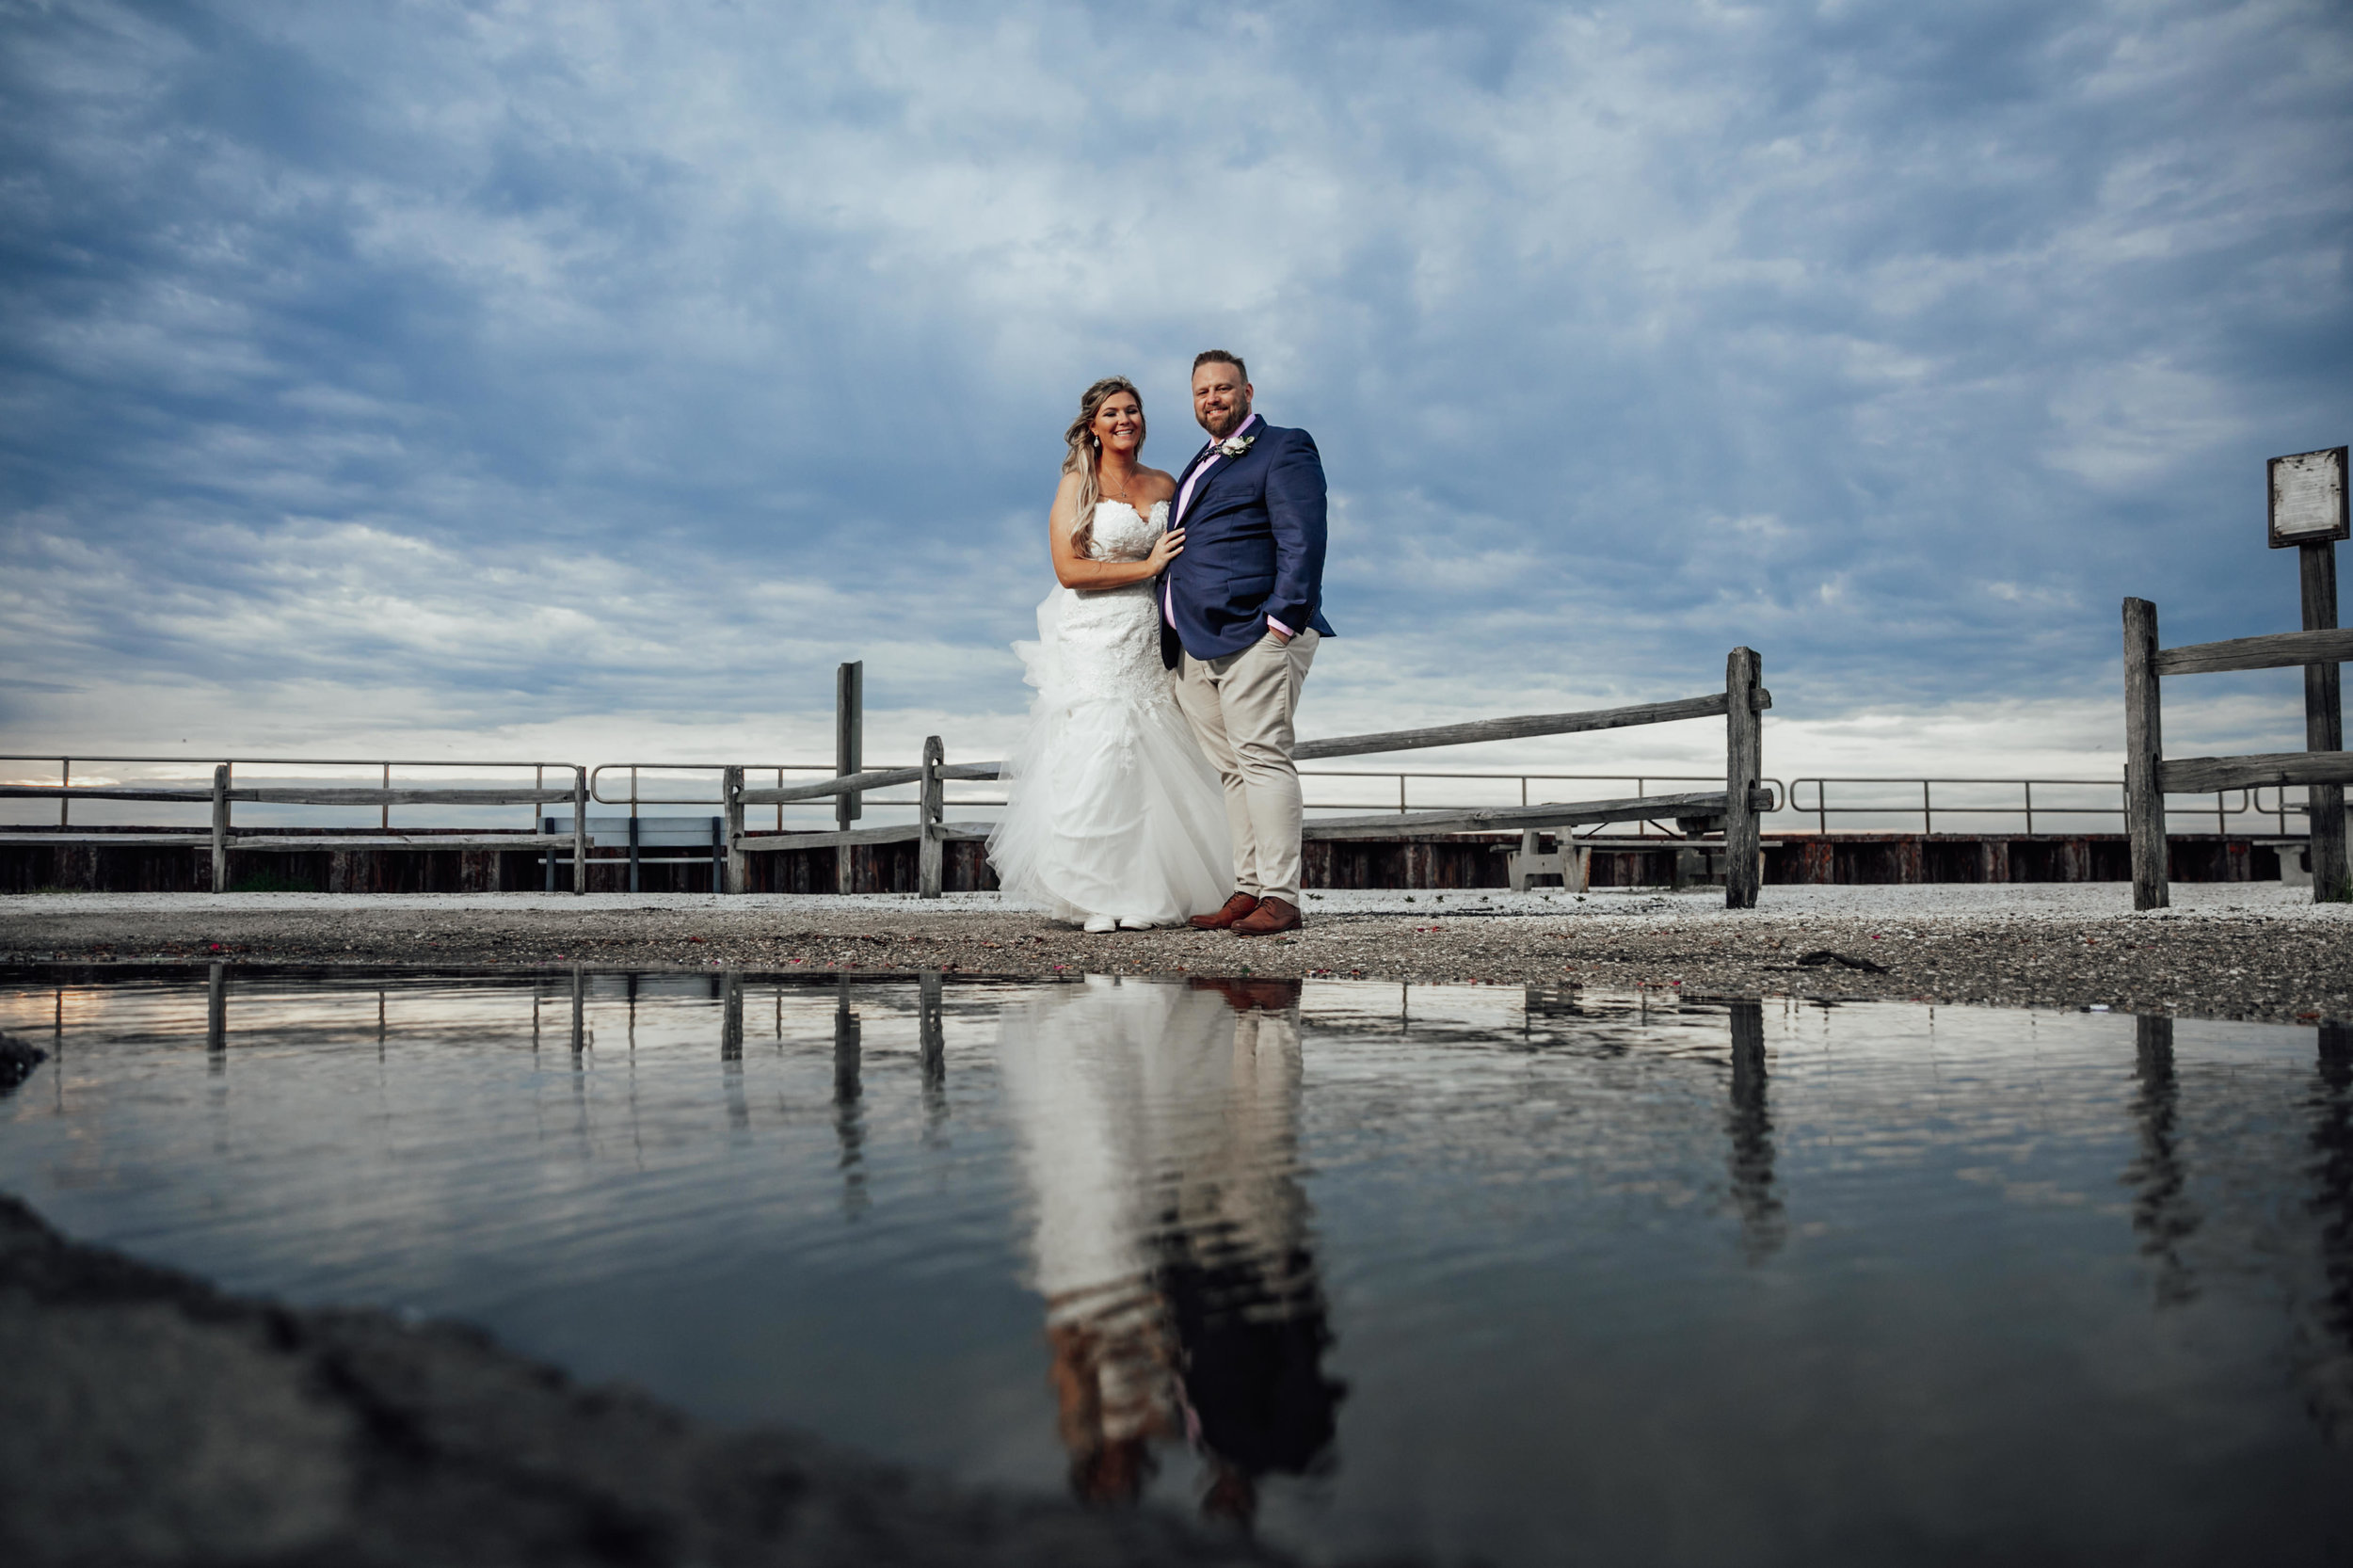 New Jersey Wedding Photographer, Felsberg Photography LBI wedding photography 116.jpg